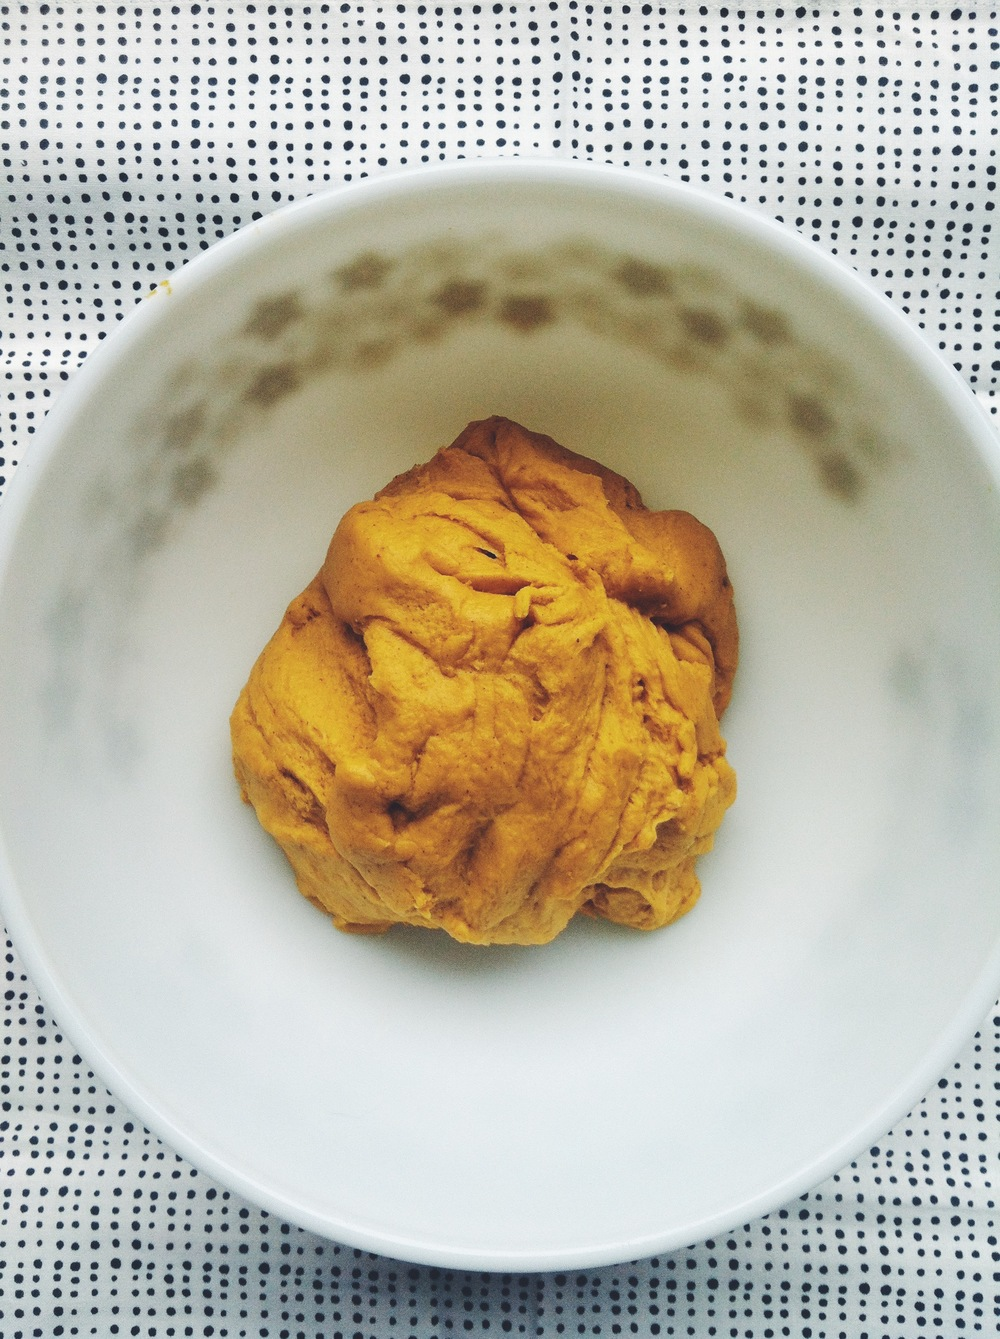 Oregon Growers Pumpkin Cinnamon Roll 3.JPG